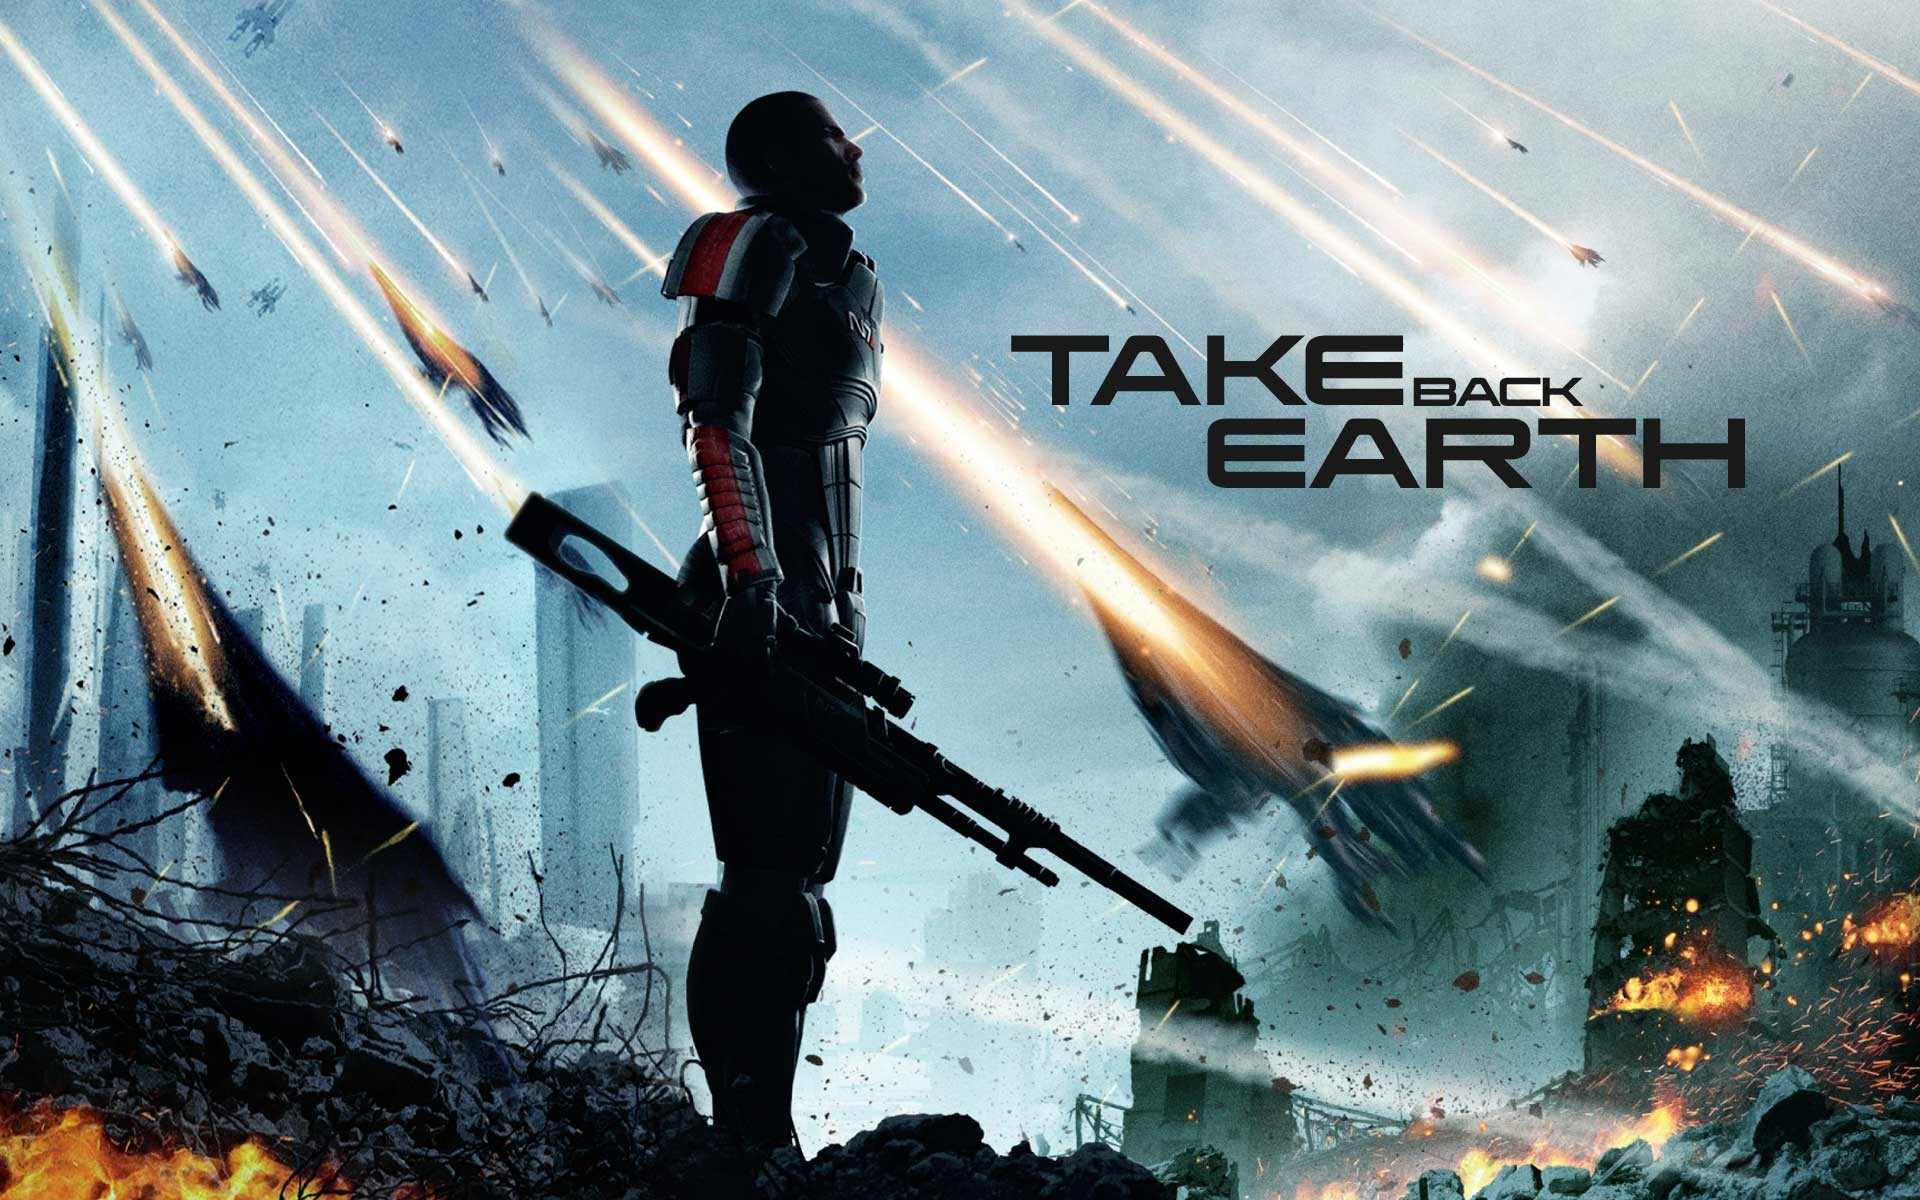 Mass Effect 3 Wallpapers – Full HD wallpaper search